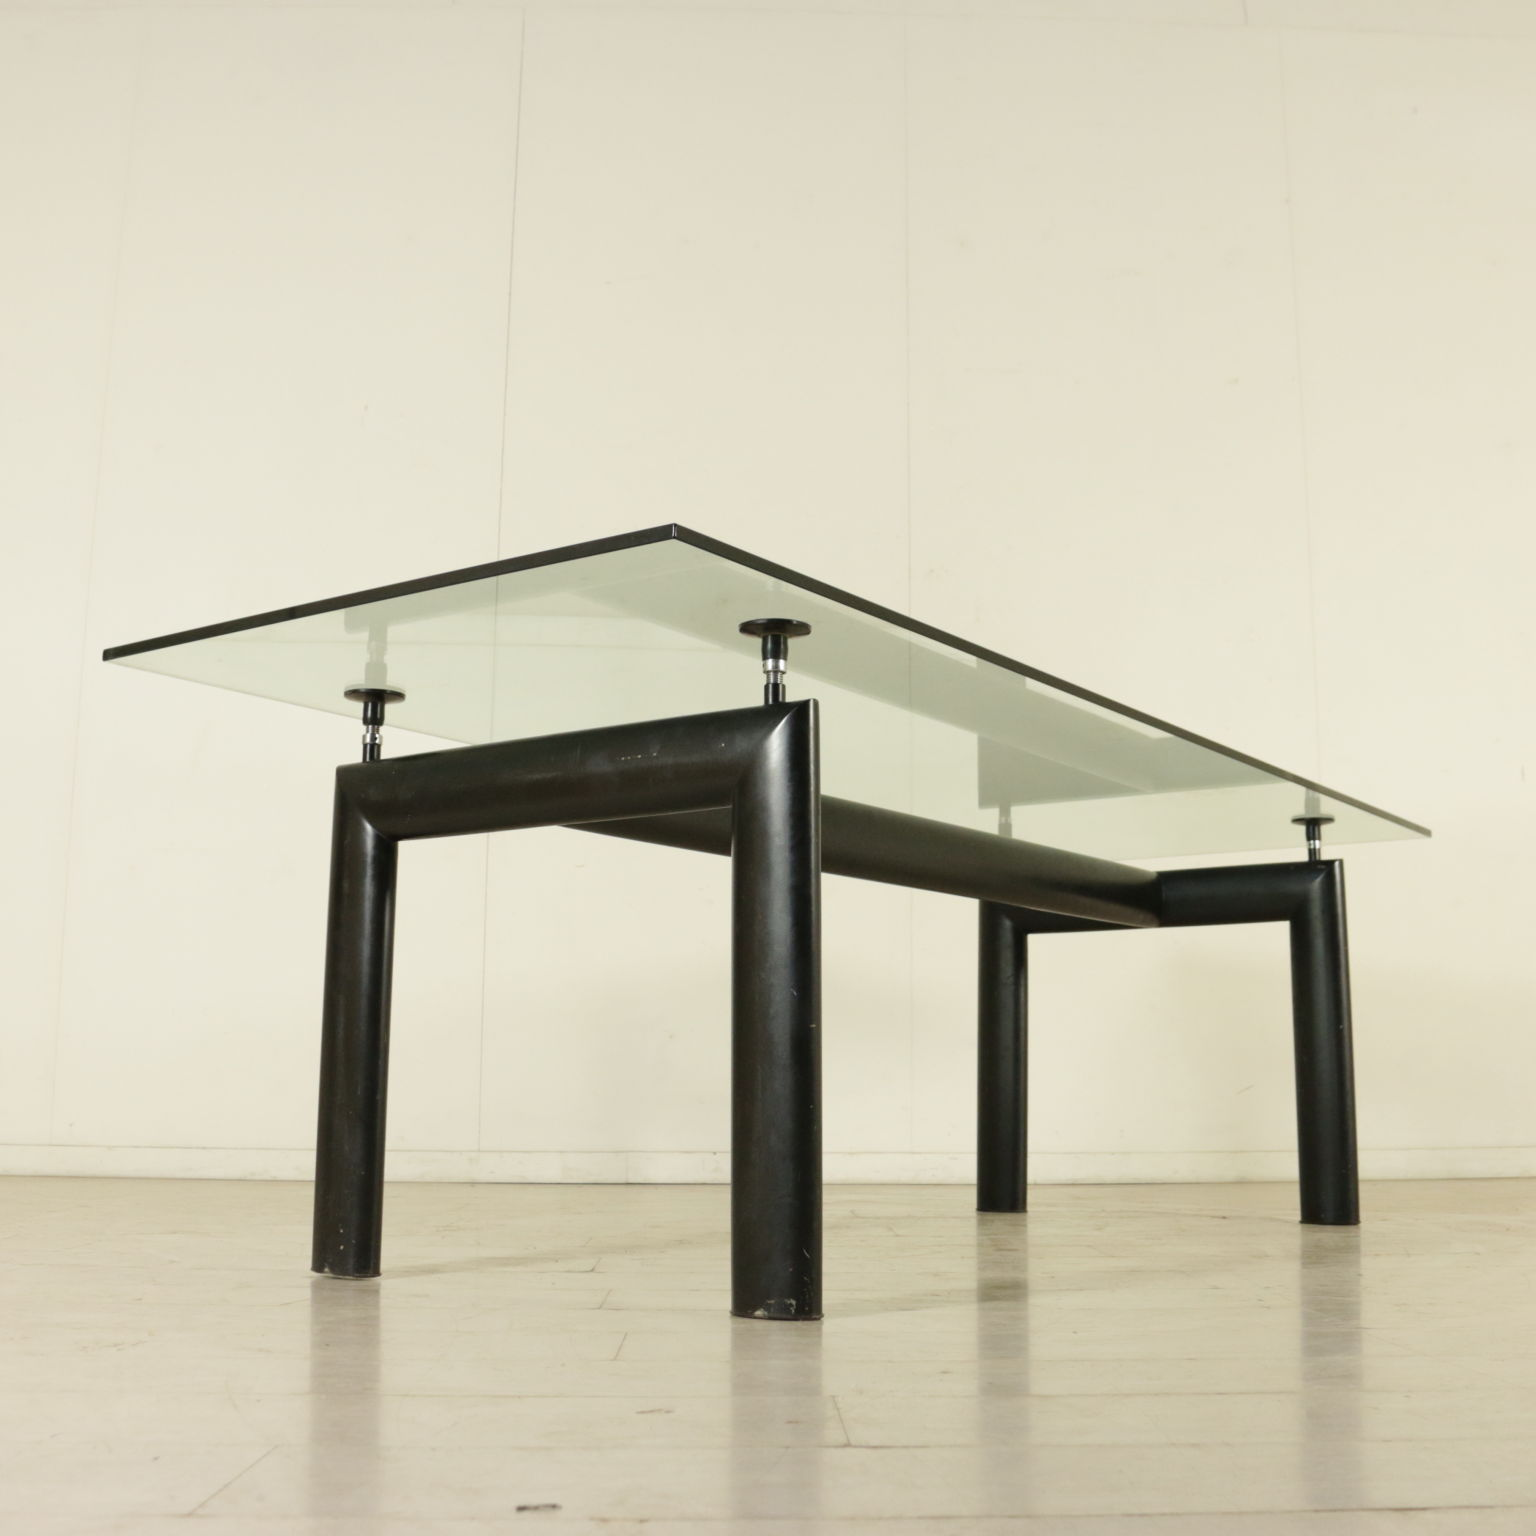 Tavolo le corbusier tavoli modernariato - Tavolo cristallo le corbusier ...